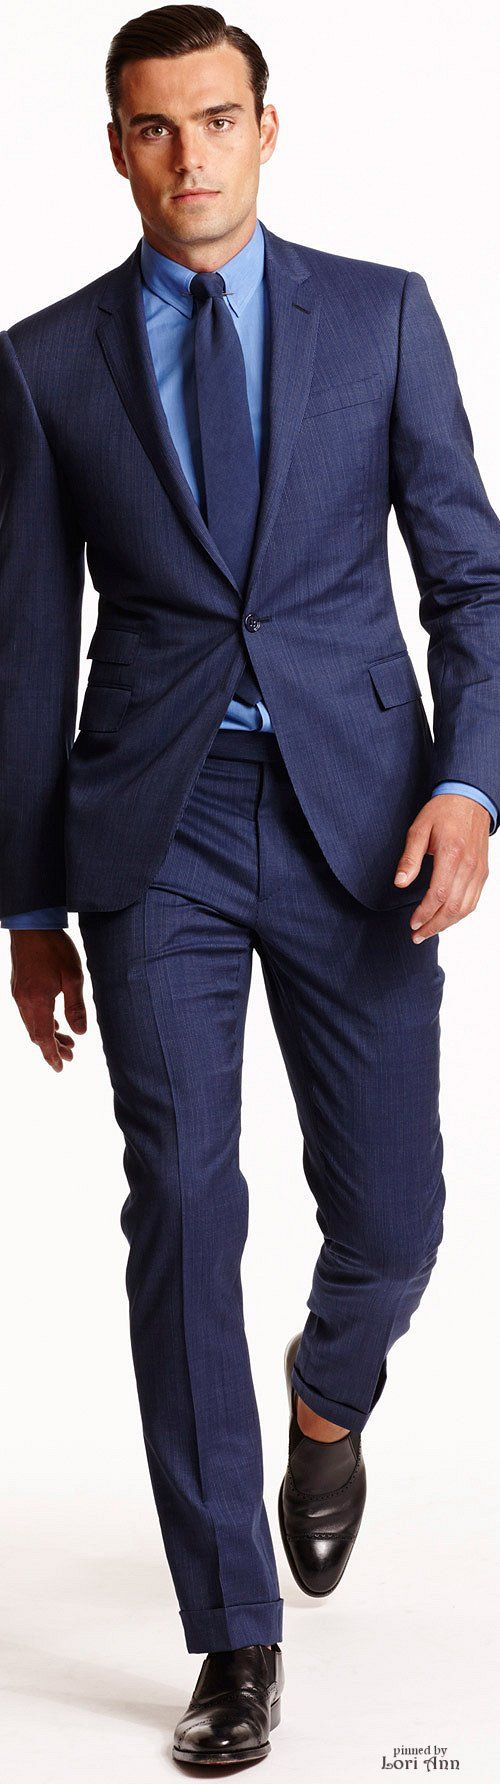 Ralph Lauren 2015 | Men's Fashion | Menswear | Sophisticated and Elegant | Gentleman Style | Men's Outfit for Spring/Summer | Shop at designerclothingfans.com